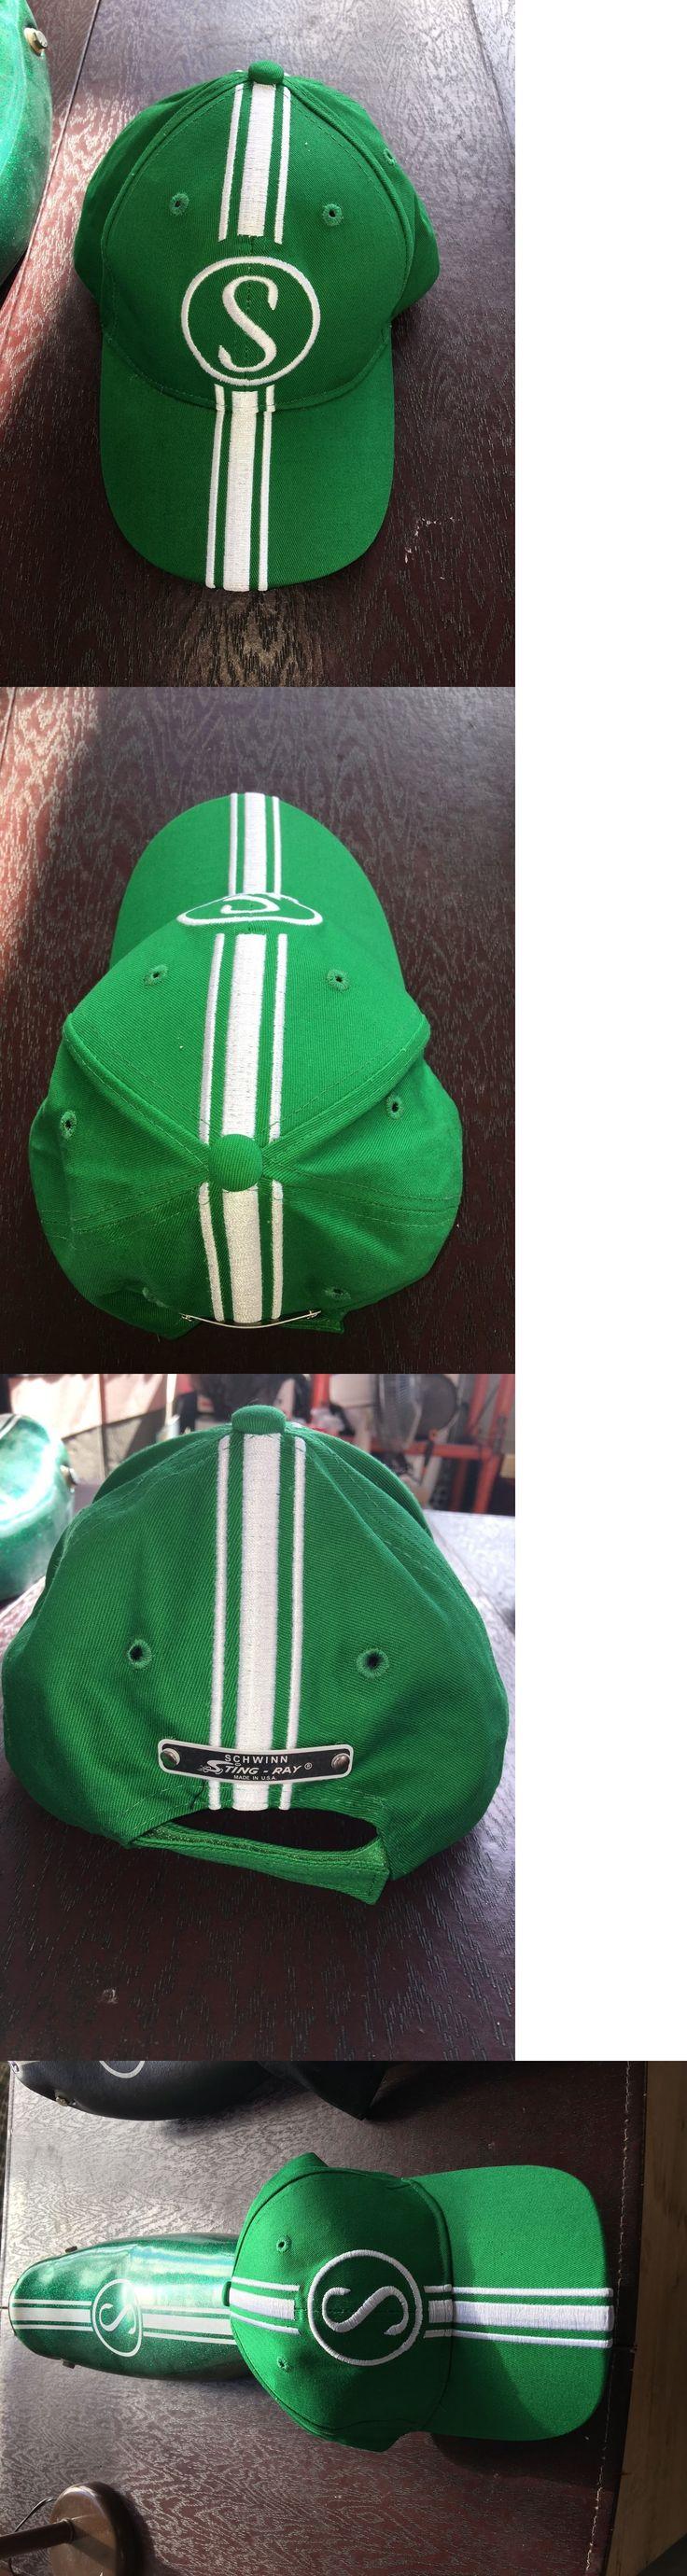 Hats Caps and Headbands 158994: Schwinn Pea Picker Stingray Hat Green W White Baseball Cap -> BUY IT NOW ONLY: $36.75 on eBay!